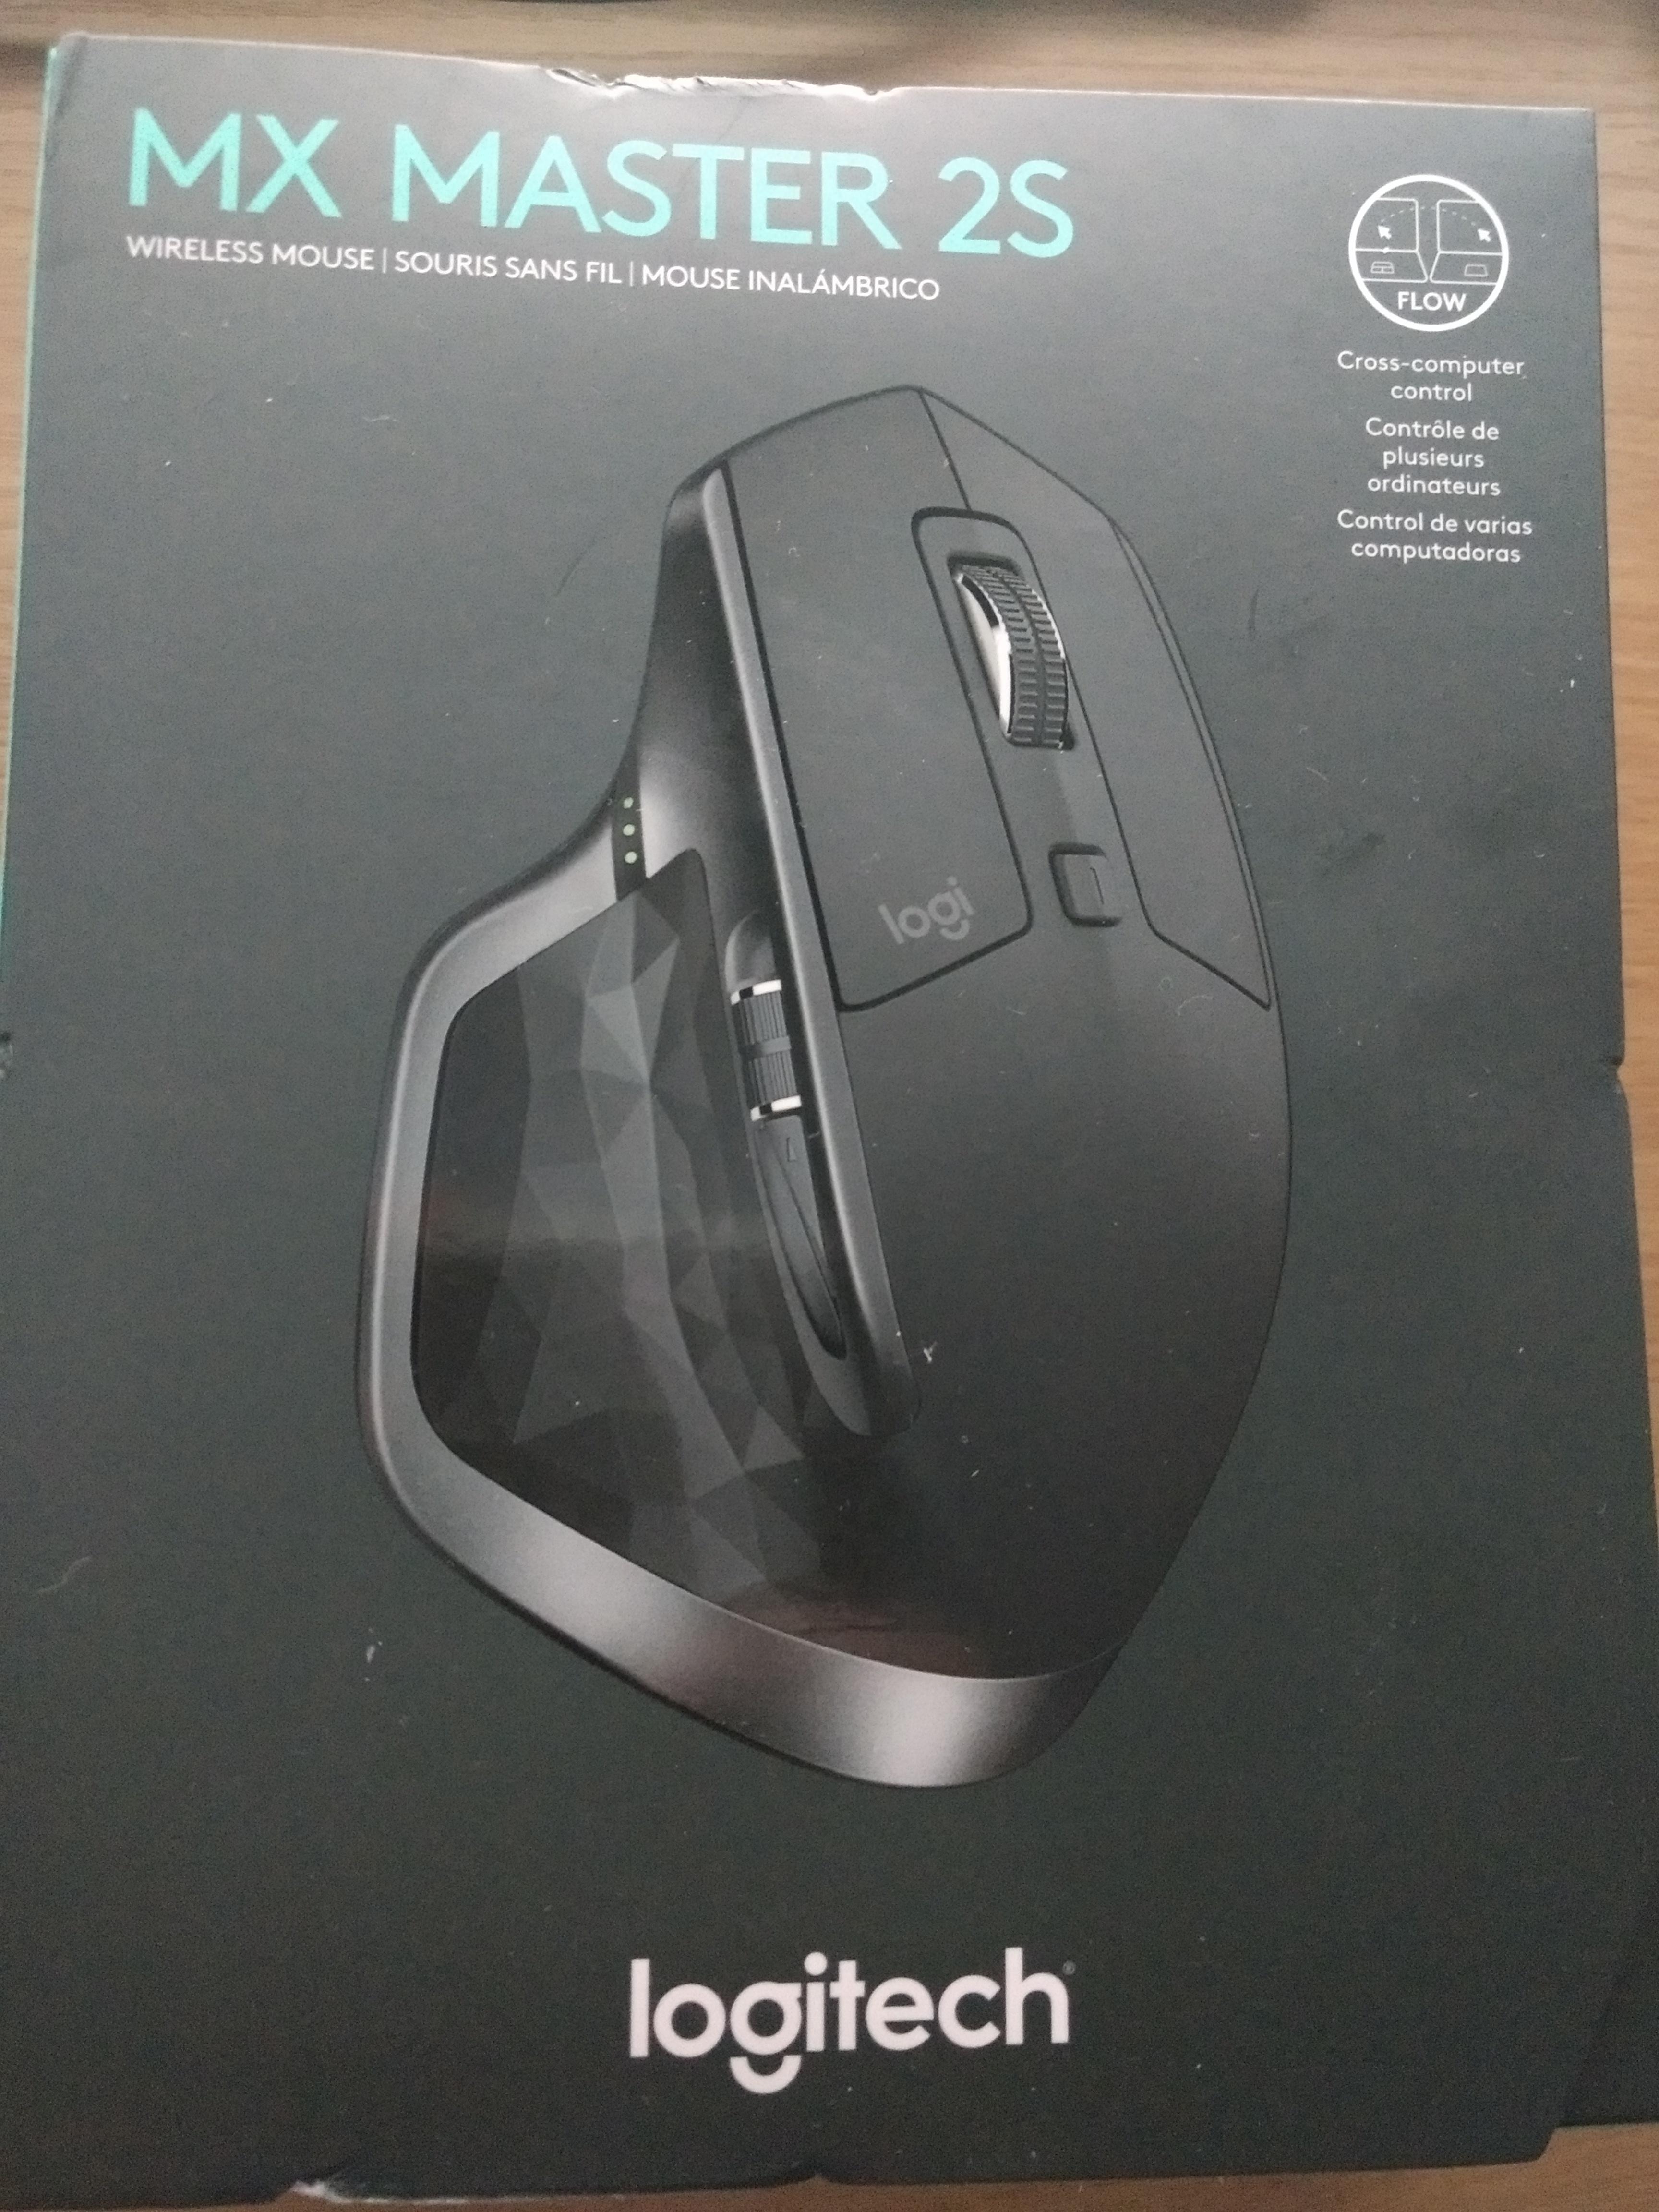 YMMV Logitech MX Master 2s Wireless Mouse 49 99 tax at OD